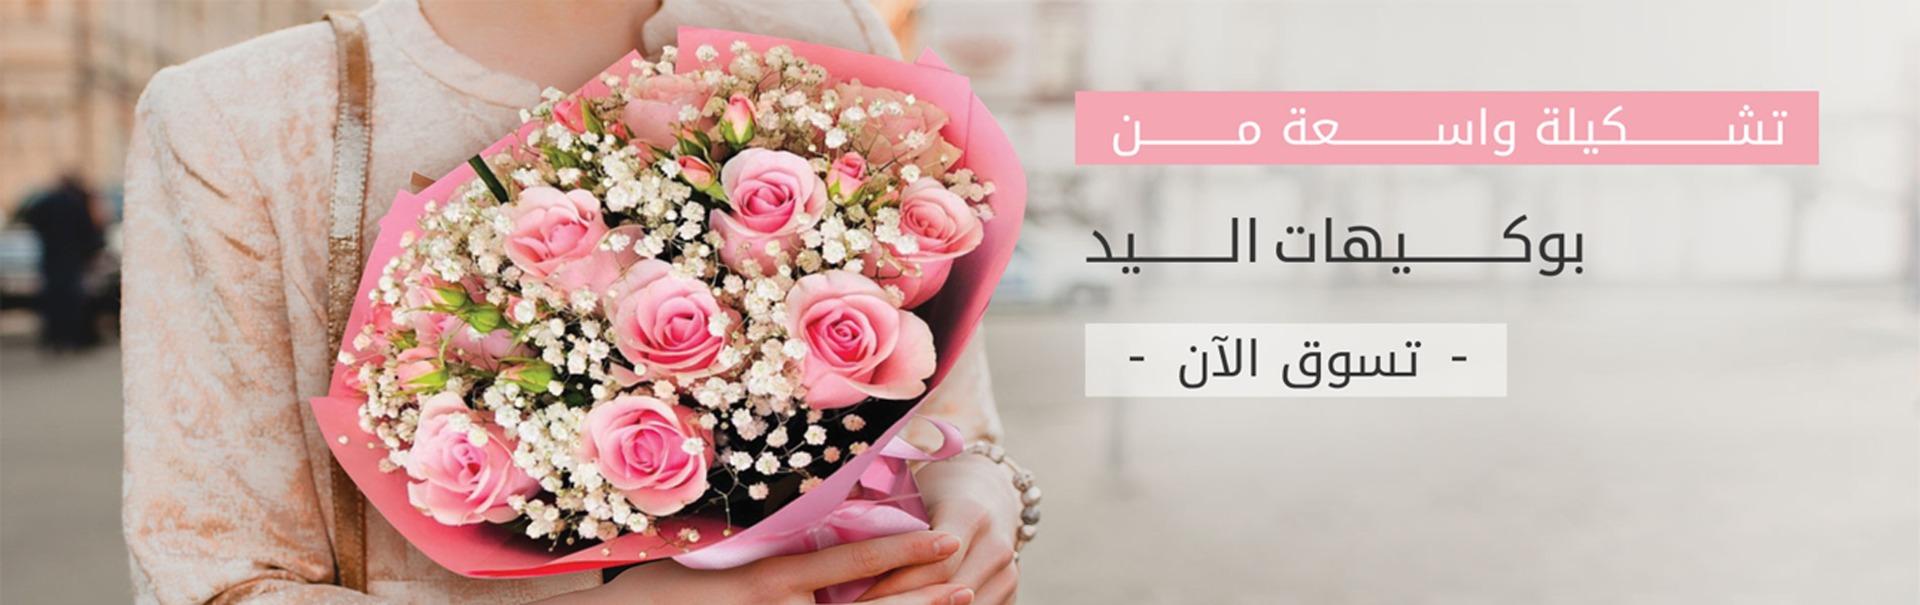 flower-delivery-services-online-riyadh/buy-hand-bouquets-baskets-online-riyadh.html